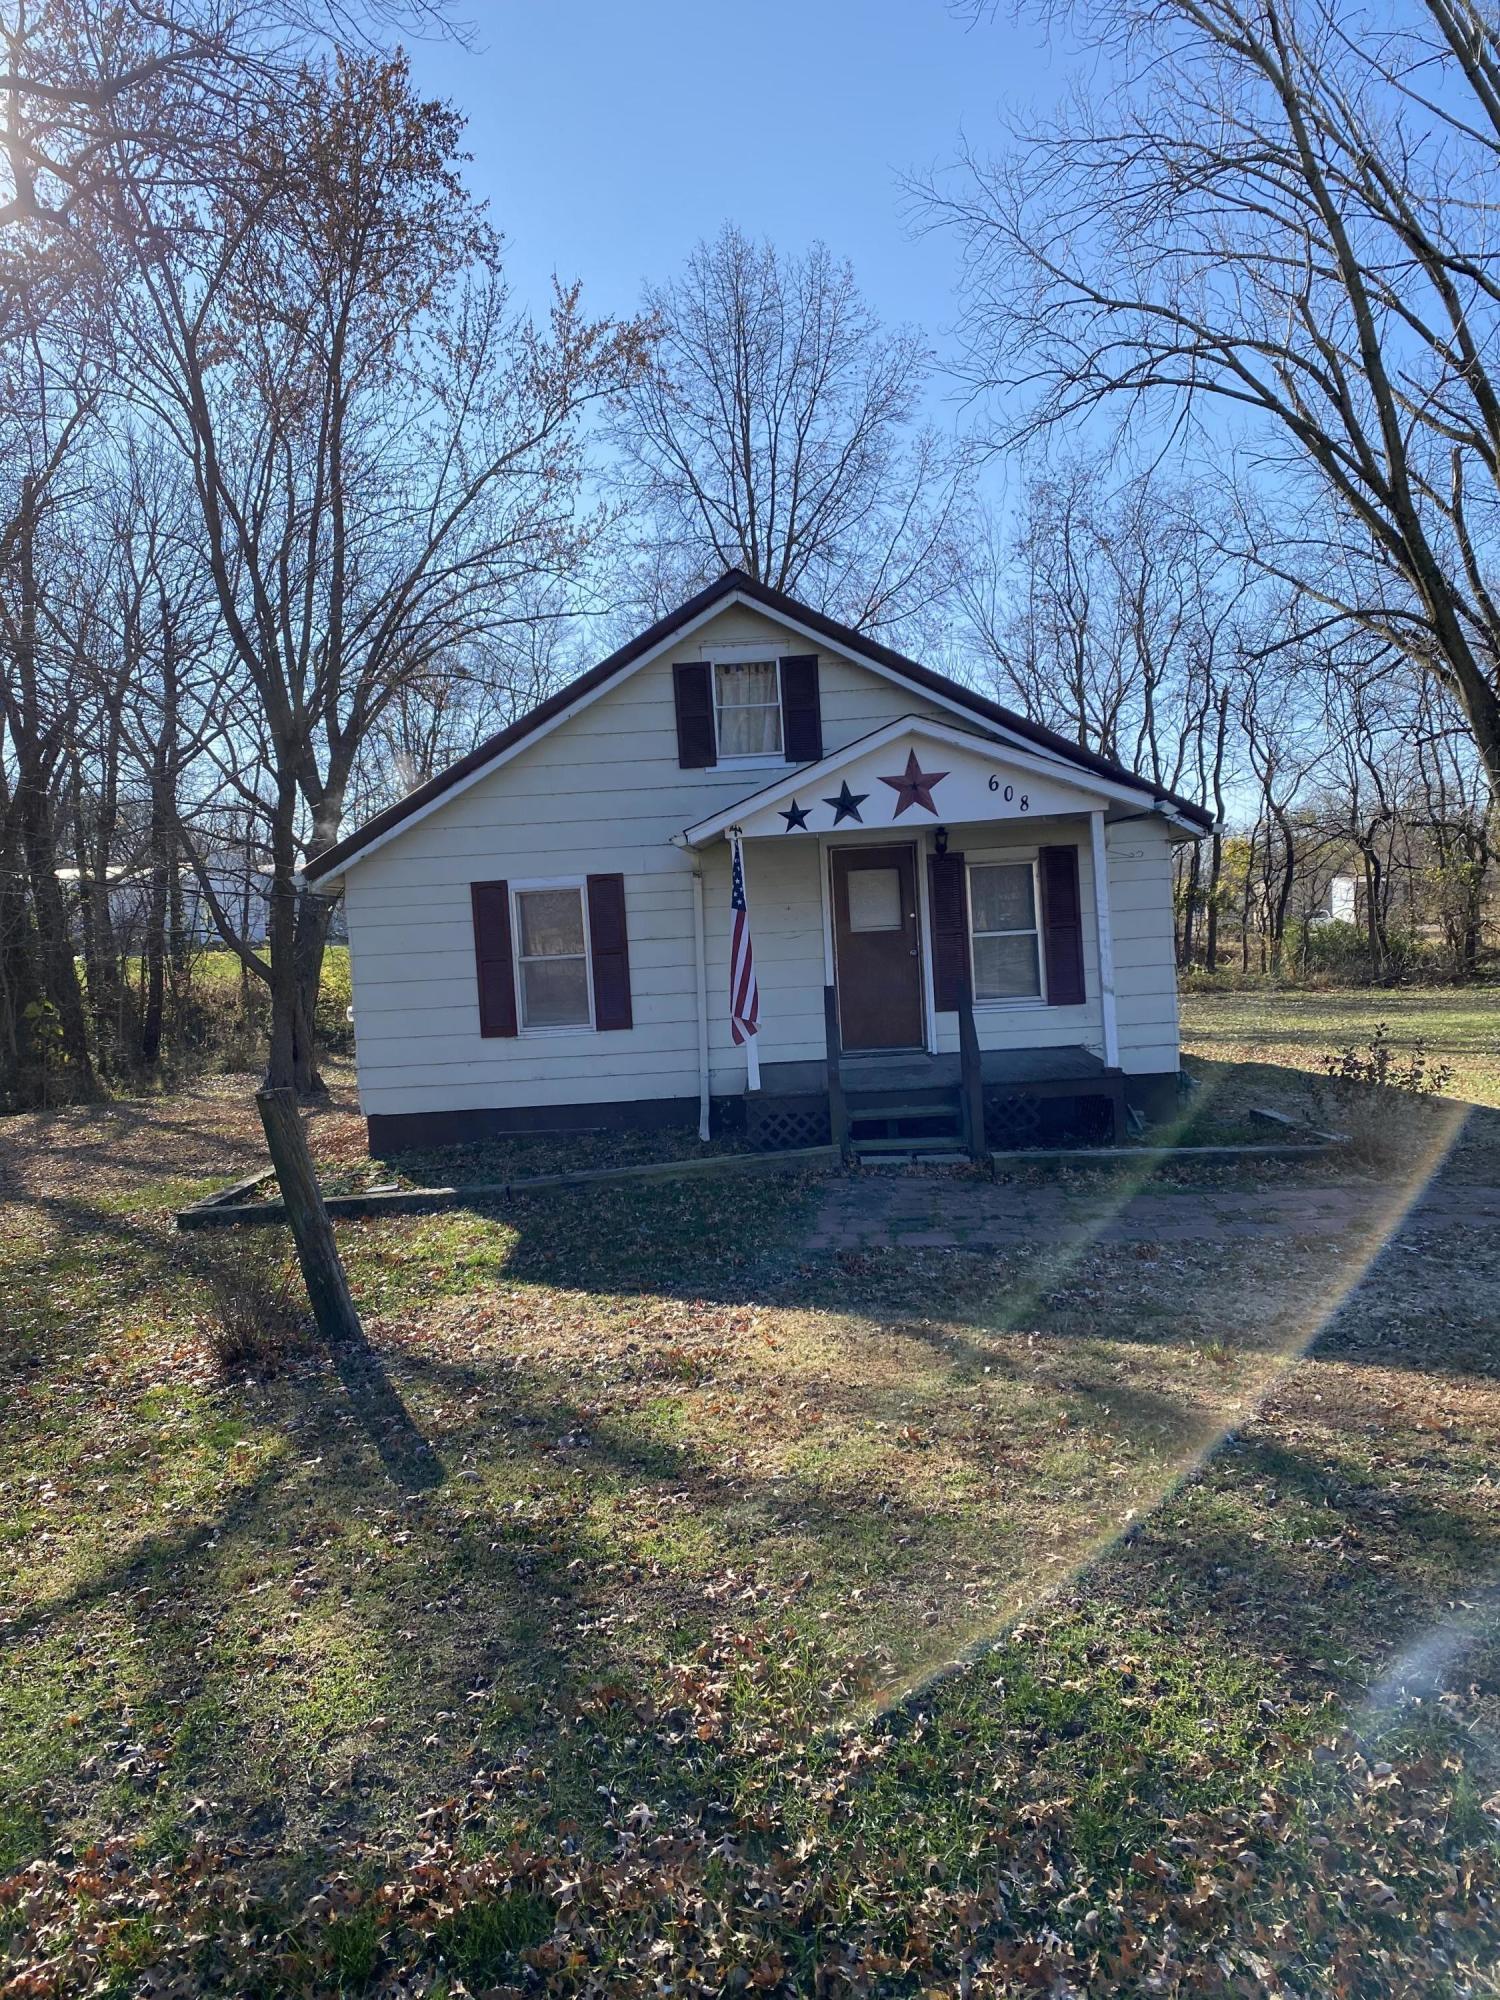 Residential for sale – 608 E 4th   Carrollton, MO